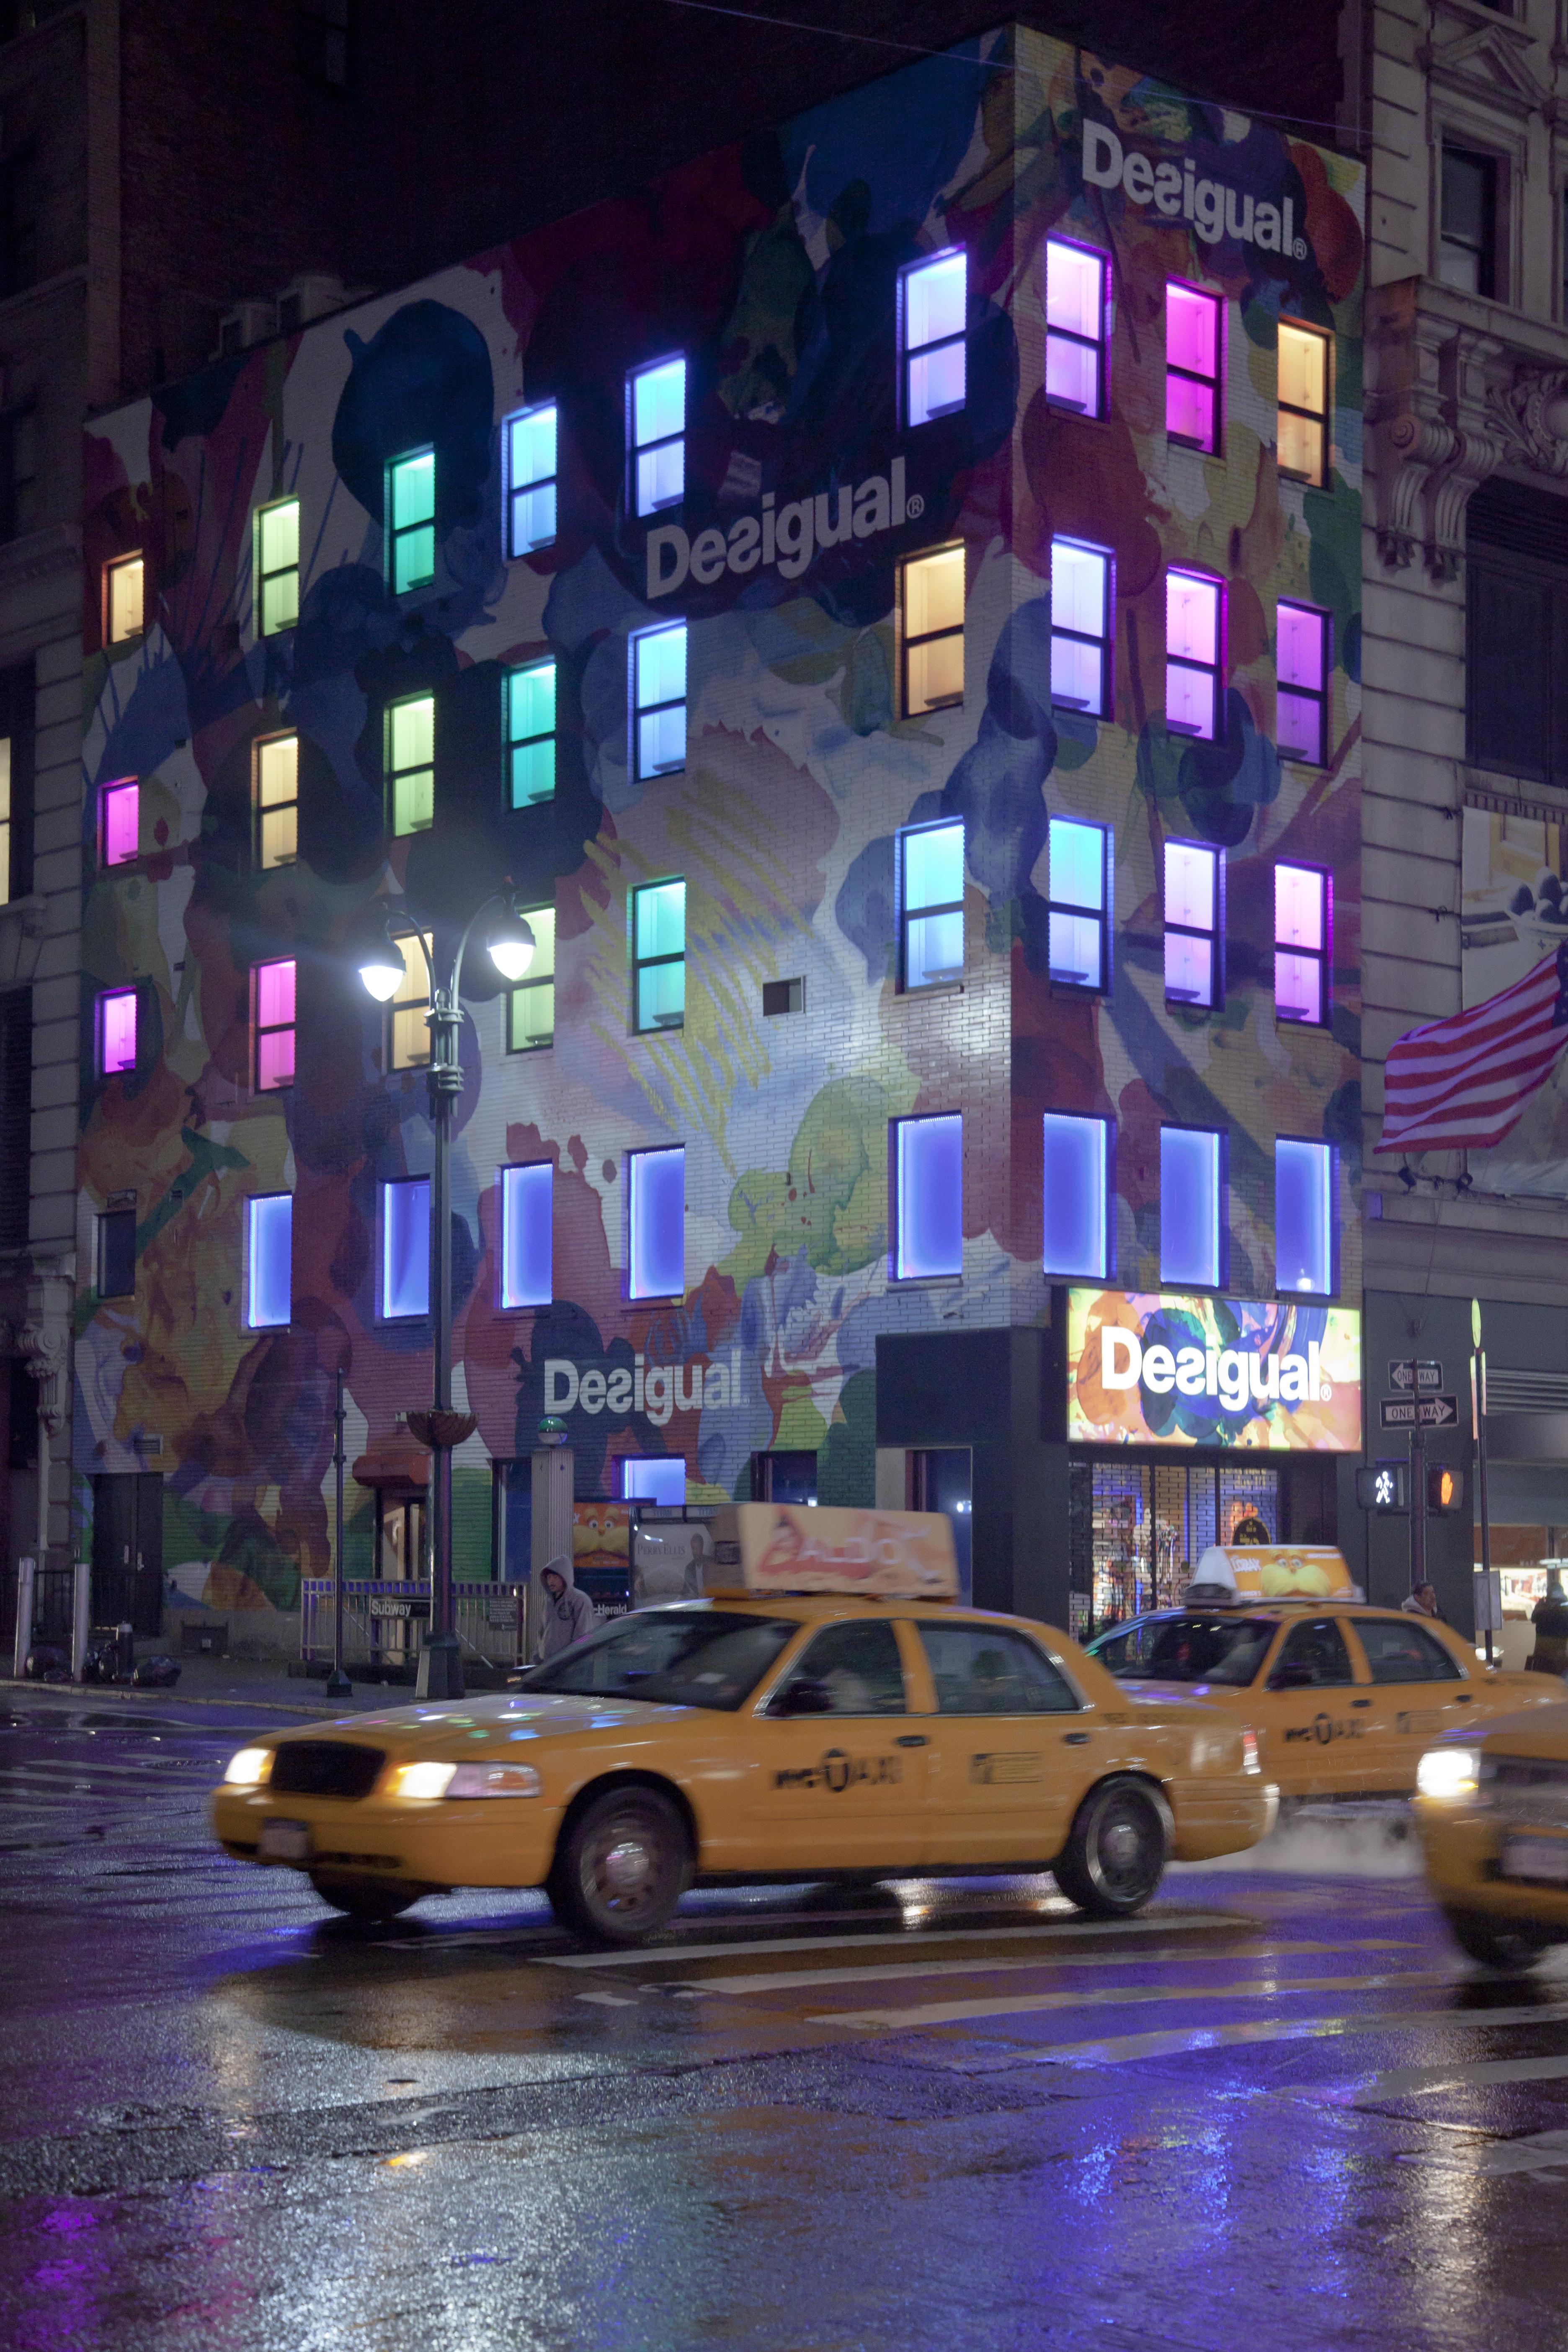 New York City Desigual Store At Night